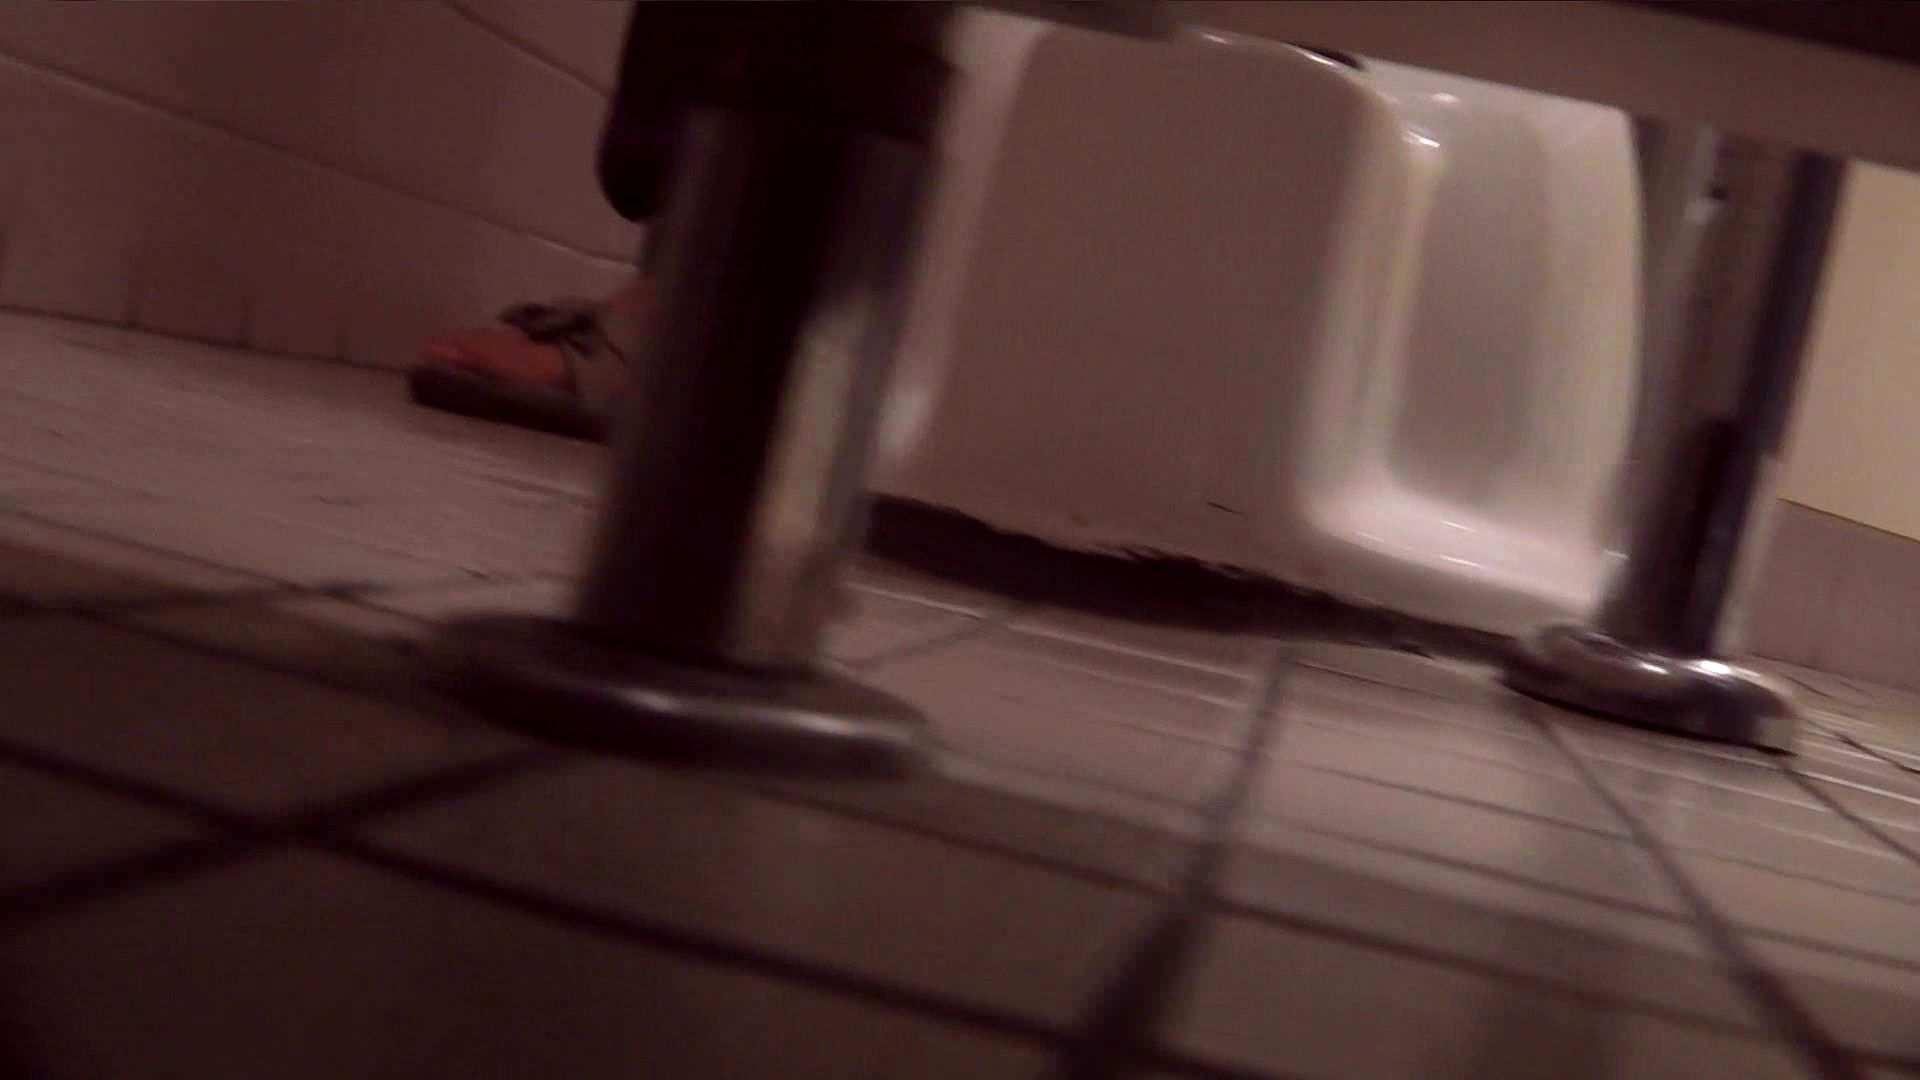 vol.16 命がけ潜伏洗面所! 美女たっぷり!! 美女のヌード おまんこ動画流出 106画像 73